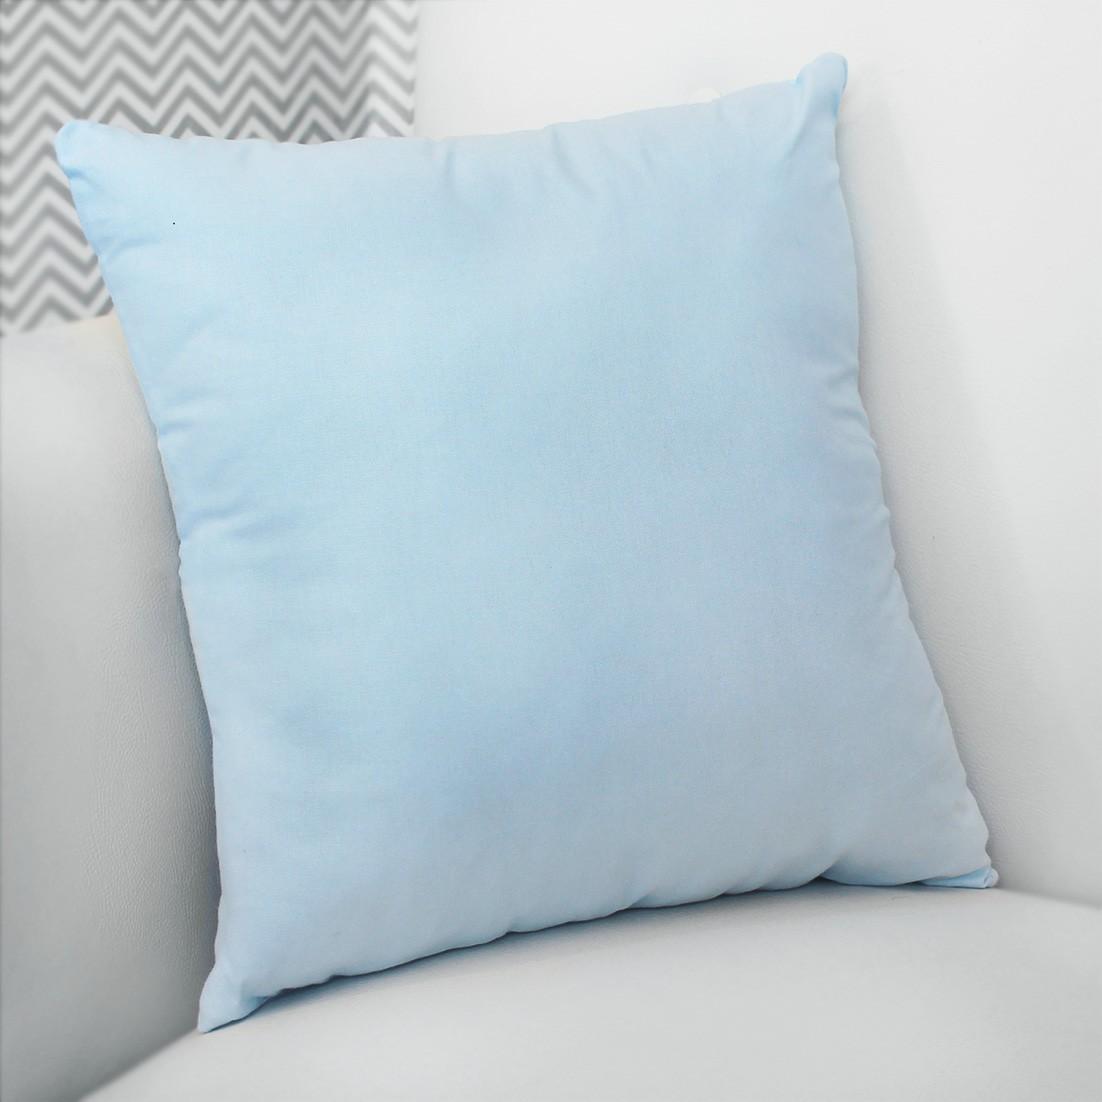 Almofada Decorativa - Azul